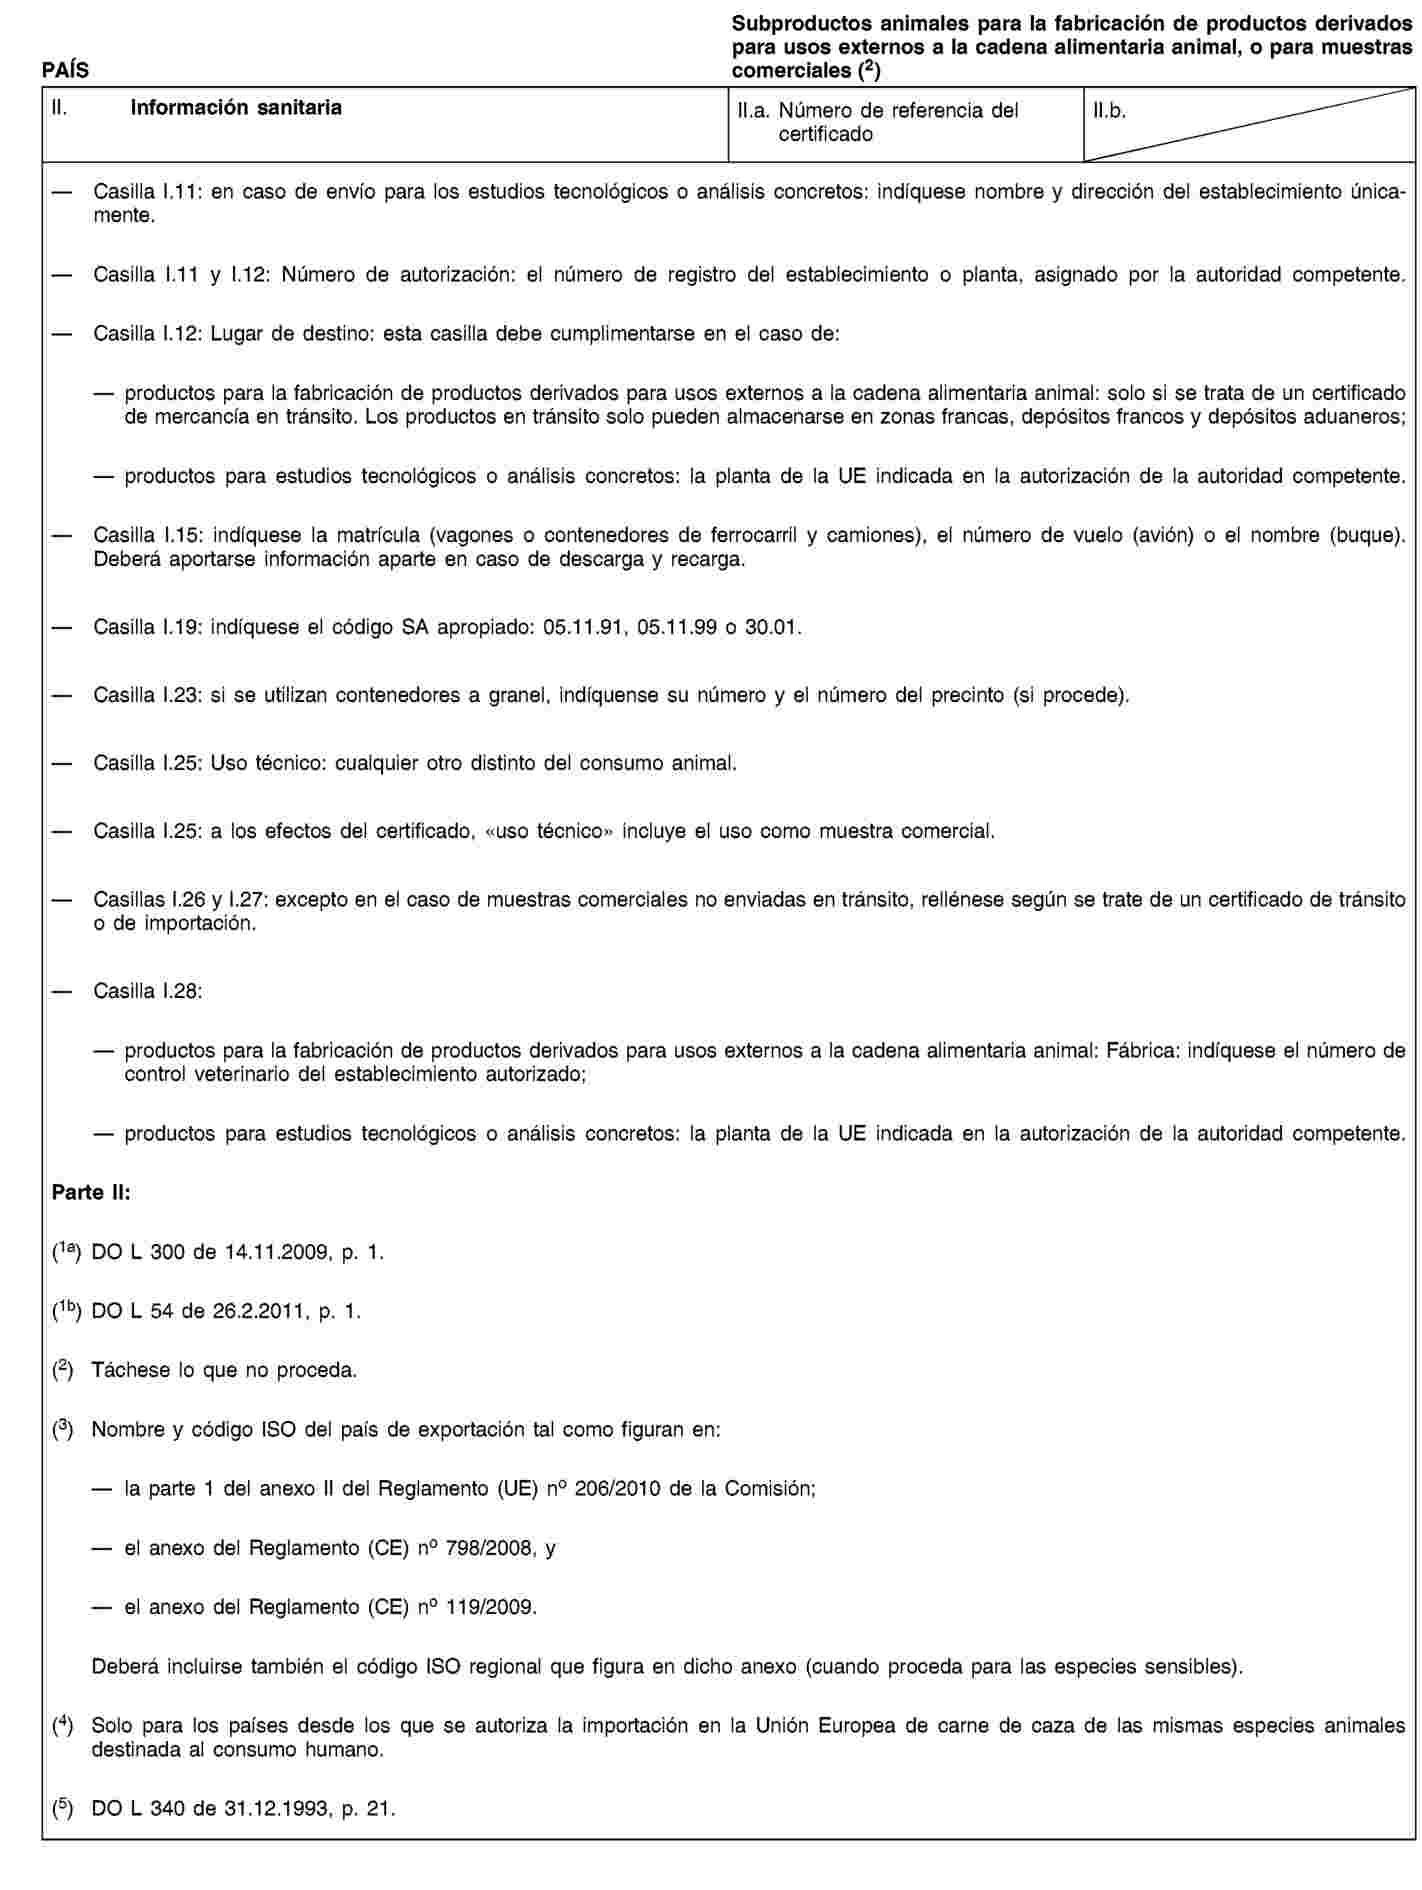 Imagen: https://eur-lex.europa.eu/resource.html?uri=uriserv:OJ.L_.2011.054.01.0001.01.SPA.xhtml.L_2011054ES.01020001.tif.jpg